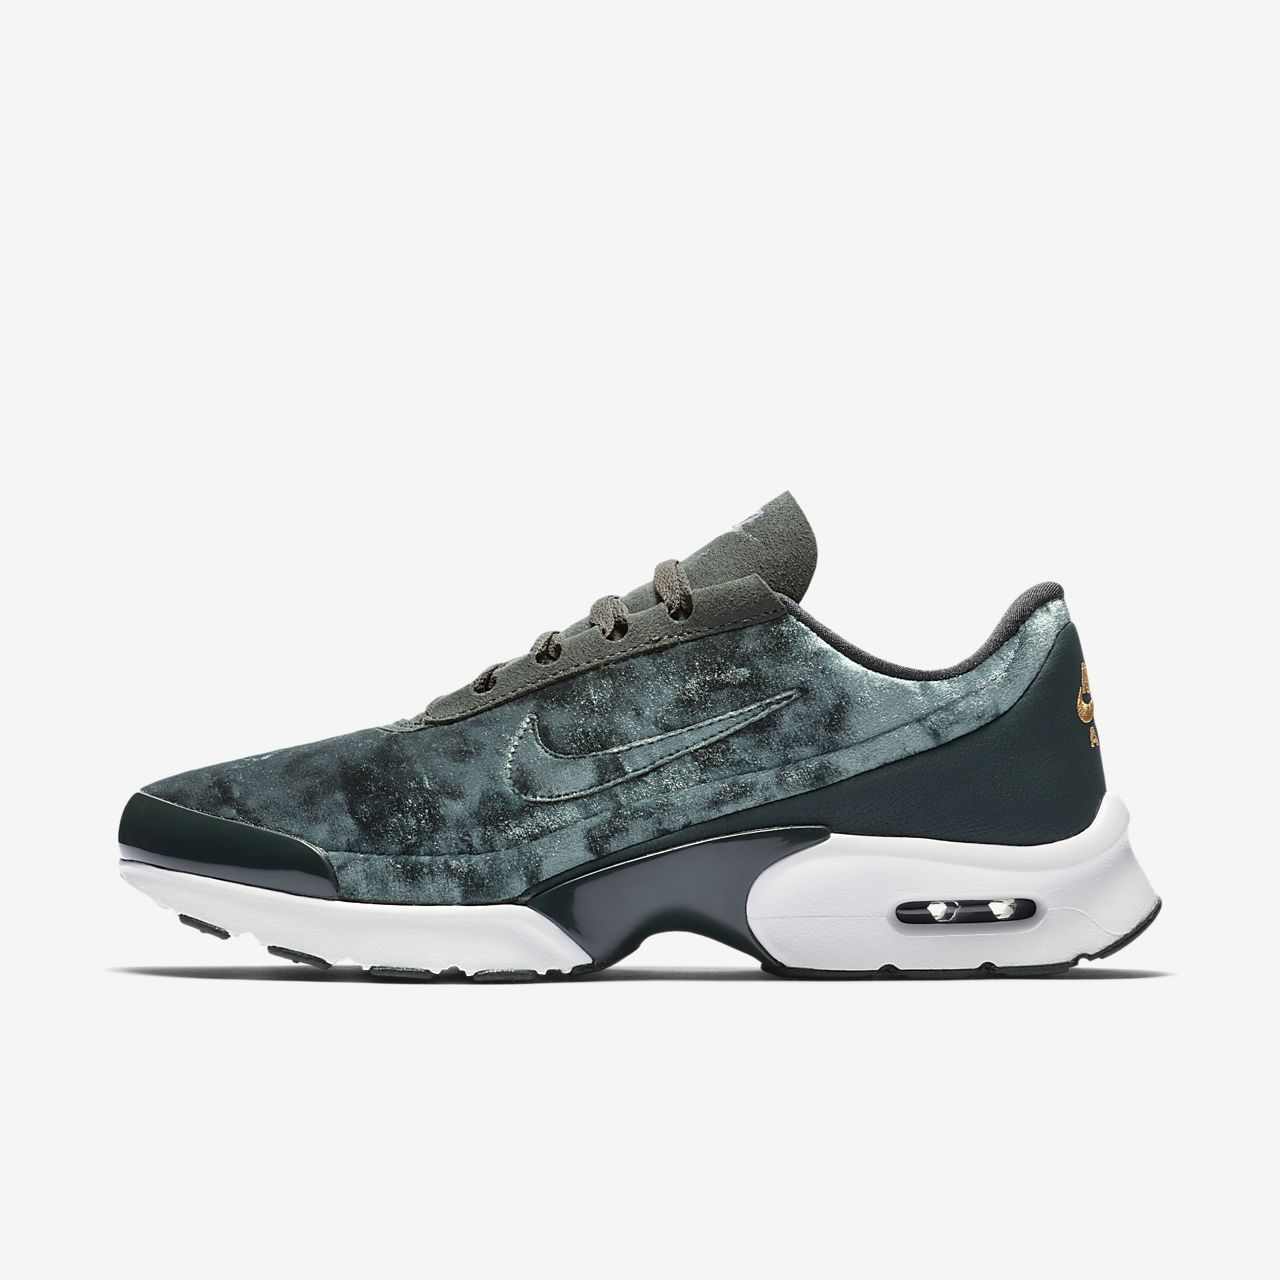 ... Nike Air Max Jewell Premium Women's Shoe